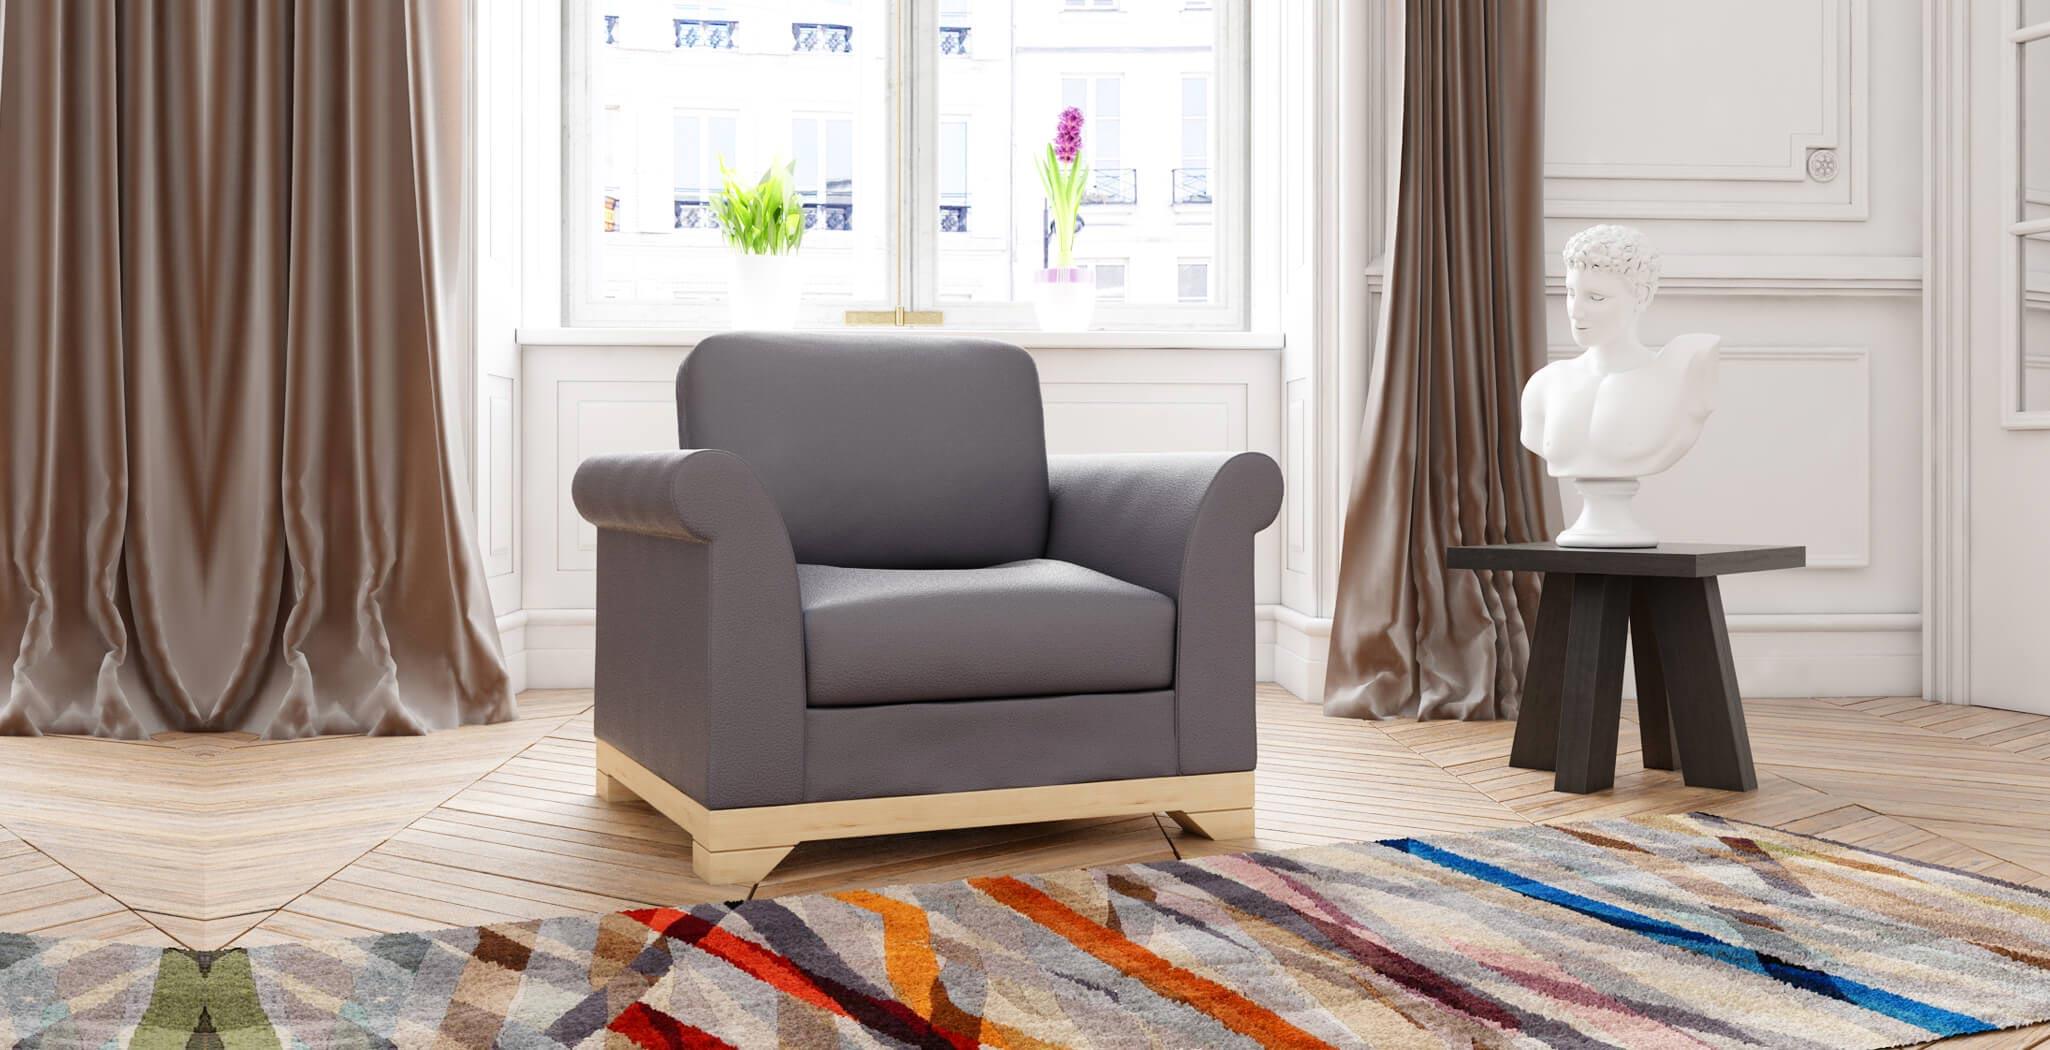 denver chair furniture gallery 3